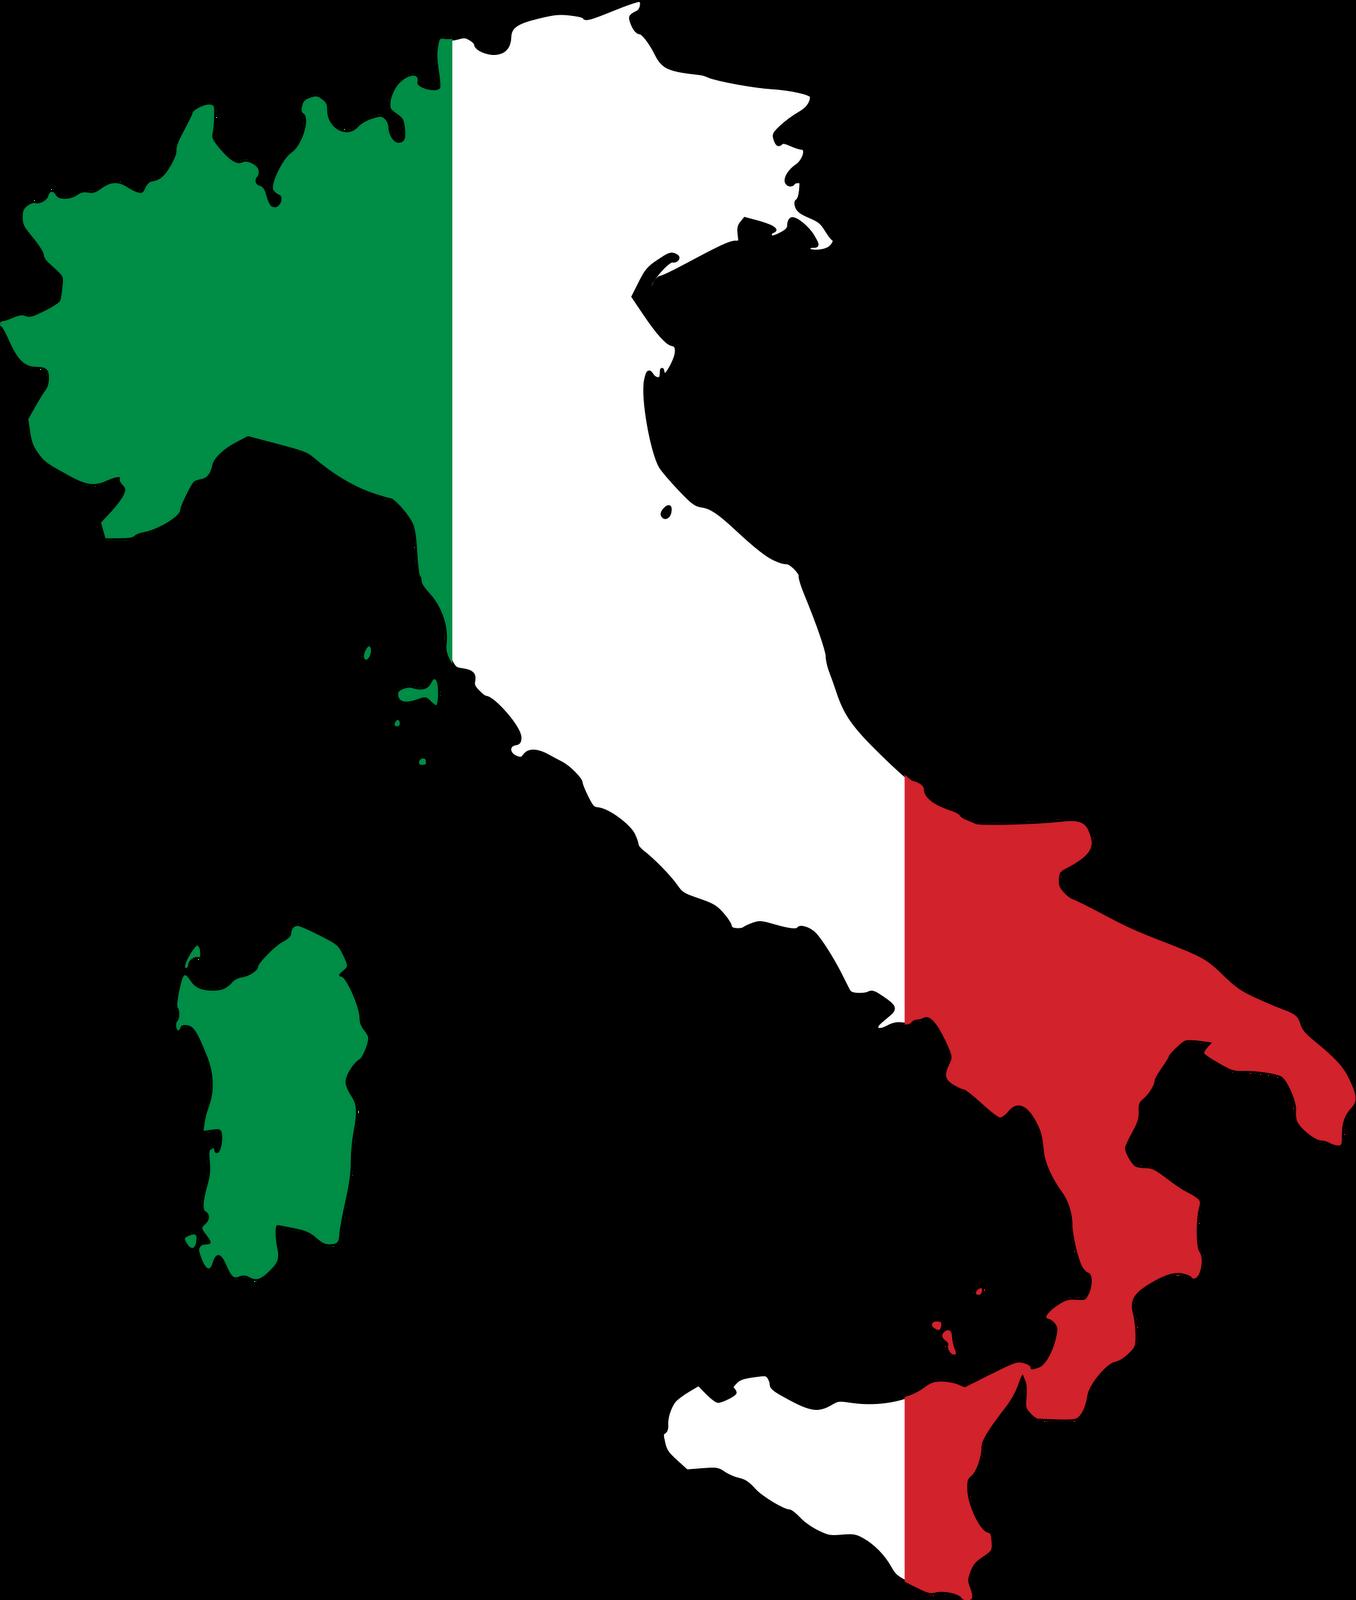 Italian clipart Art Art Images Italy Free